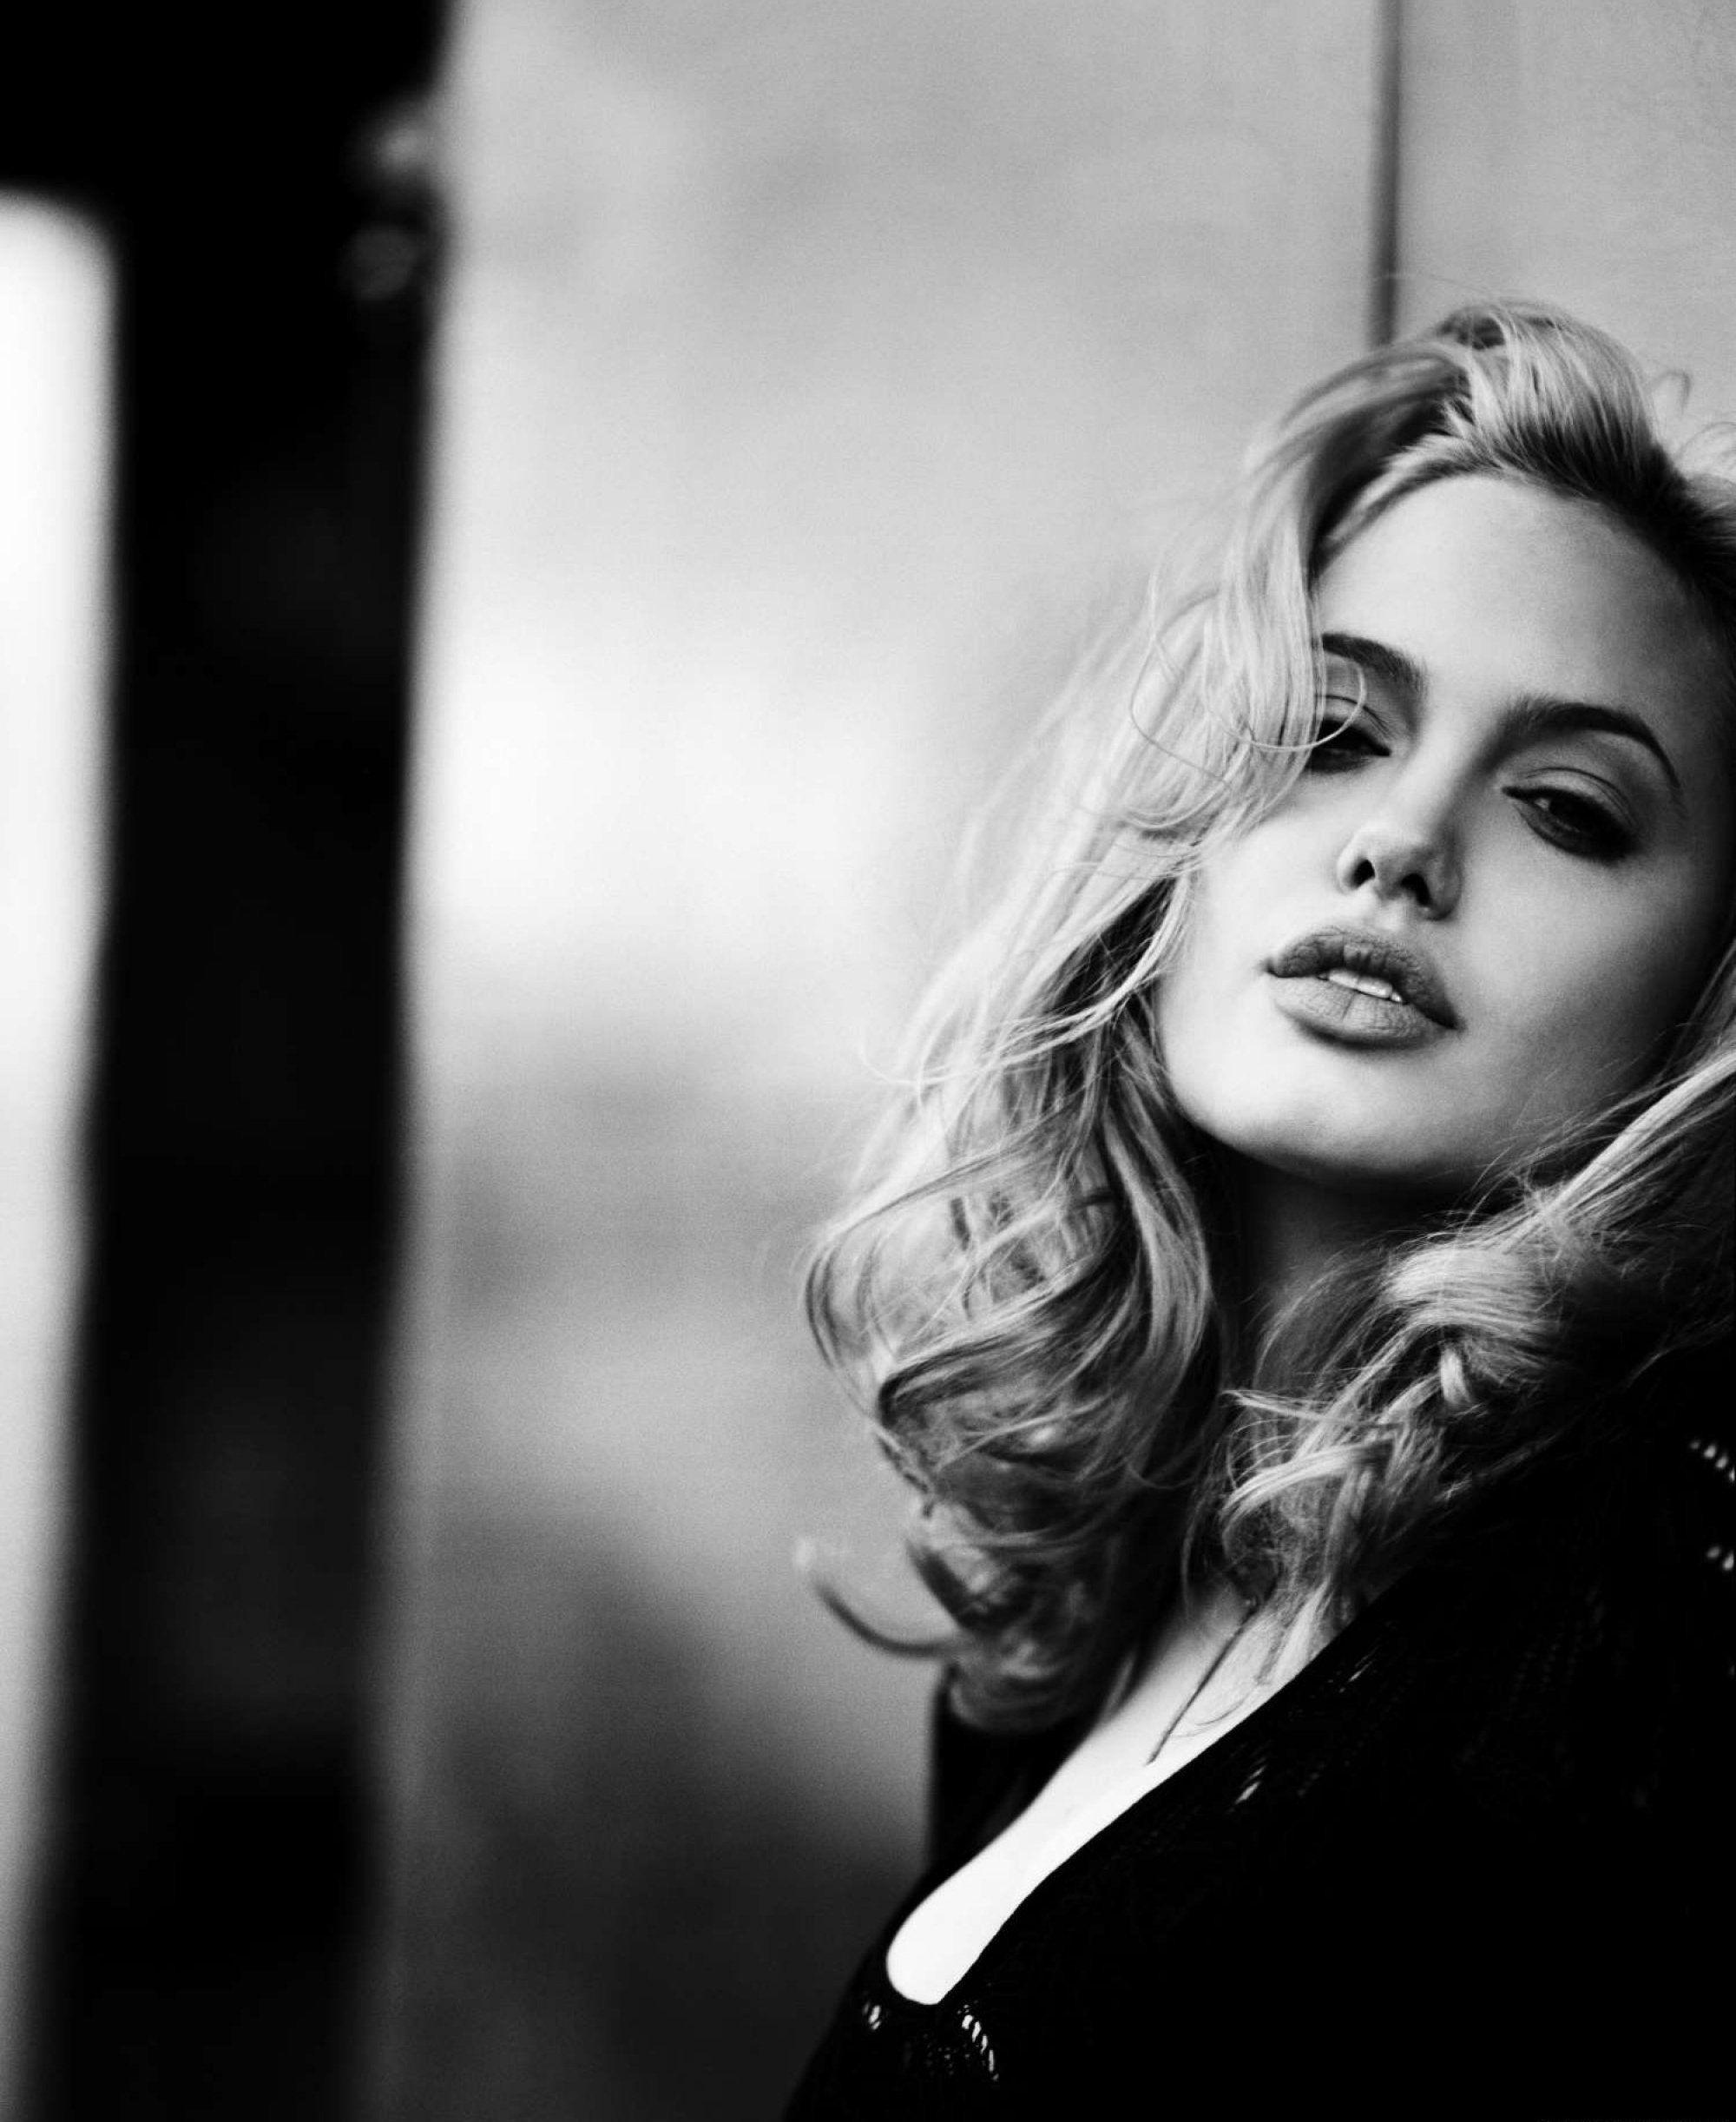 Angelina Jolie Wallpapers Full HD p Best HD Angelina Jolie